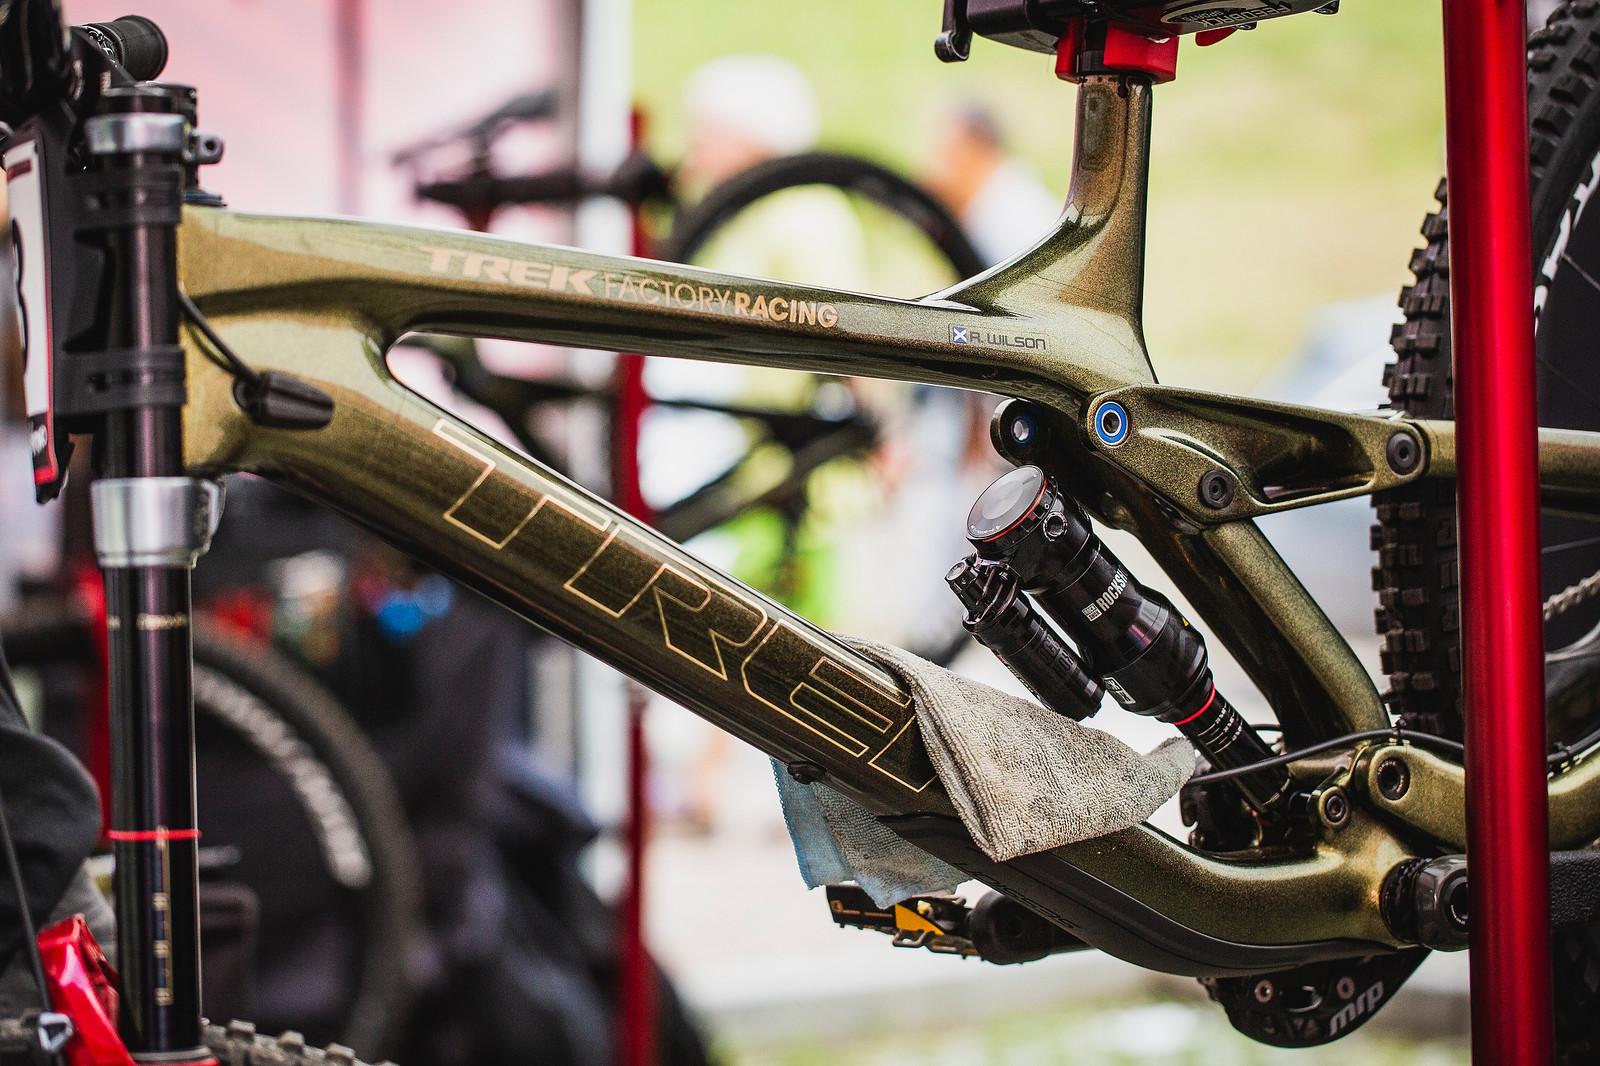 Reece Wilson's Trek Bling - PIT BITS - 2019 Val di Sole World Cup Downhill Bike Tech - Mountain Biking Pictures - Vital MTB